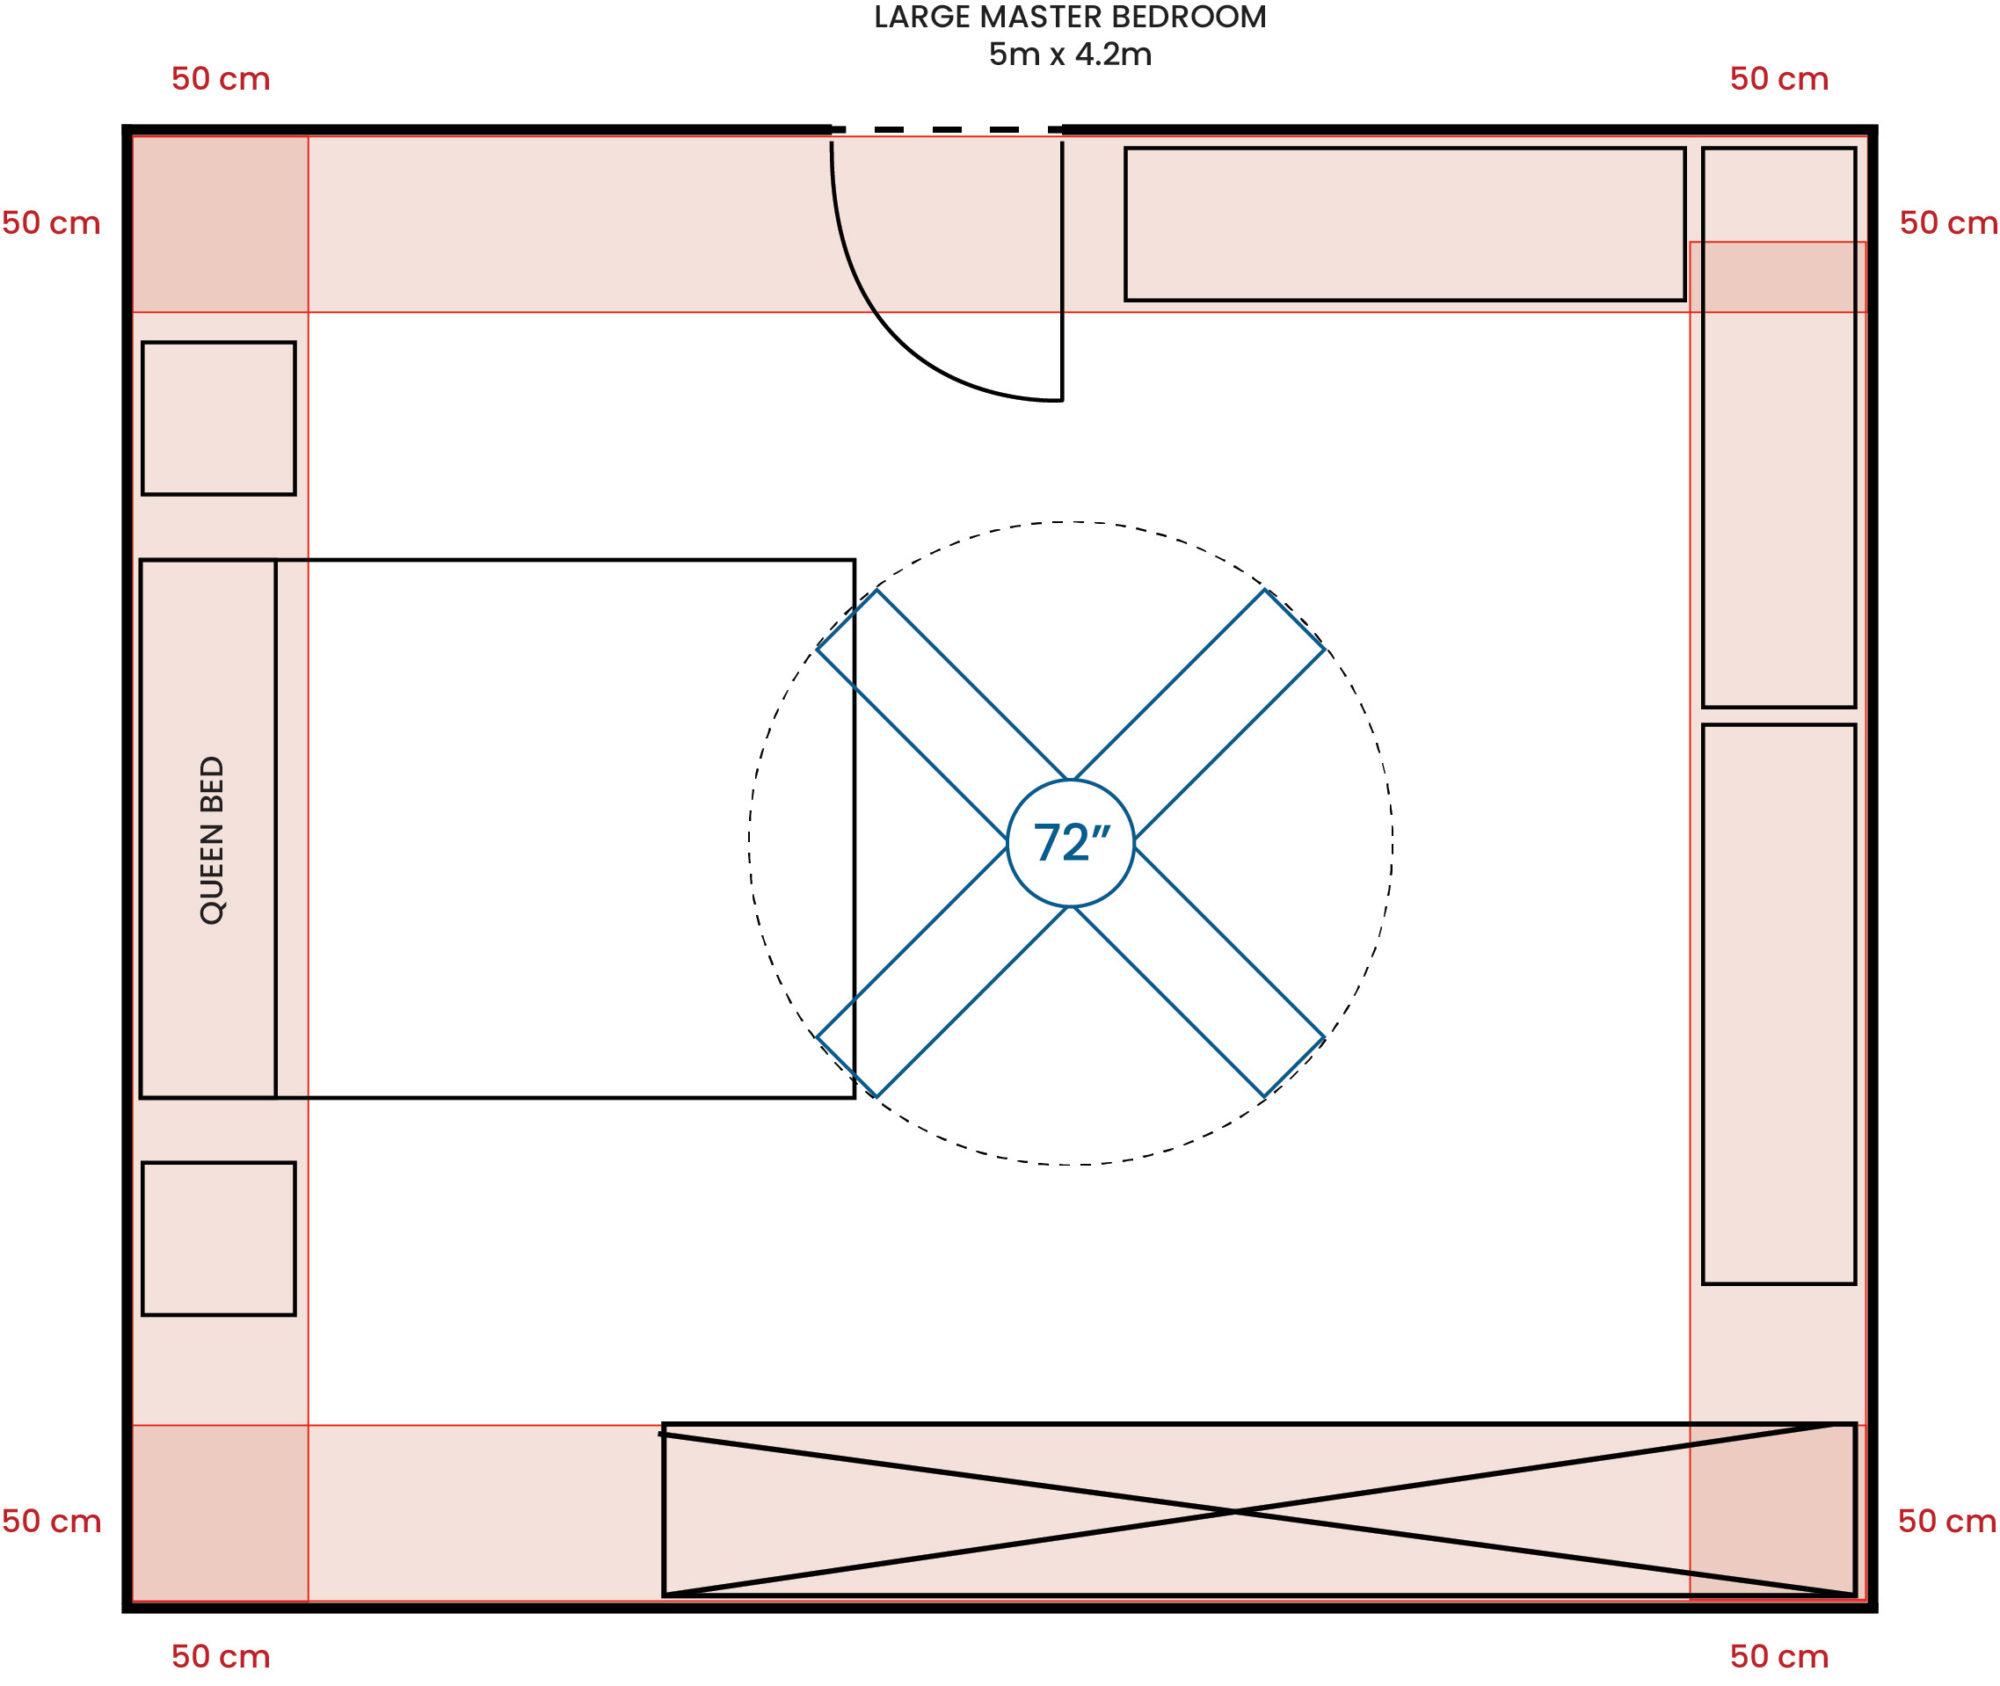 Large Master Bedroom 500 420 72F G